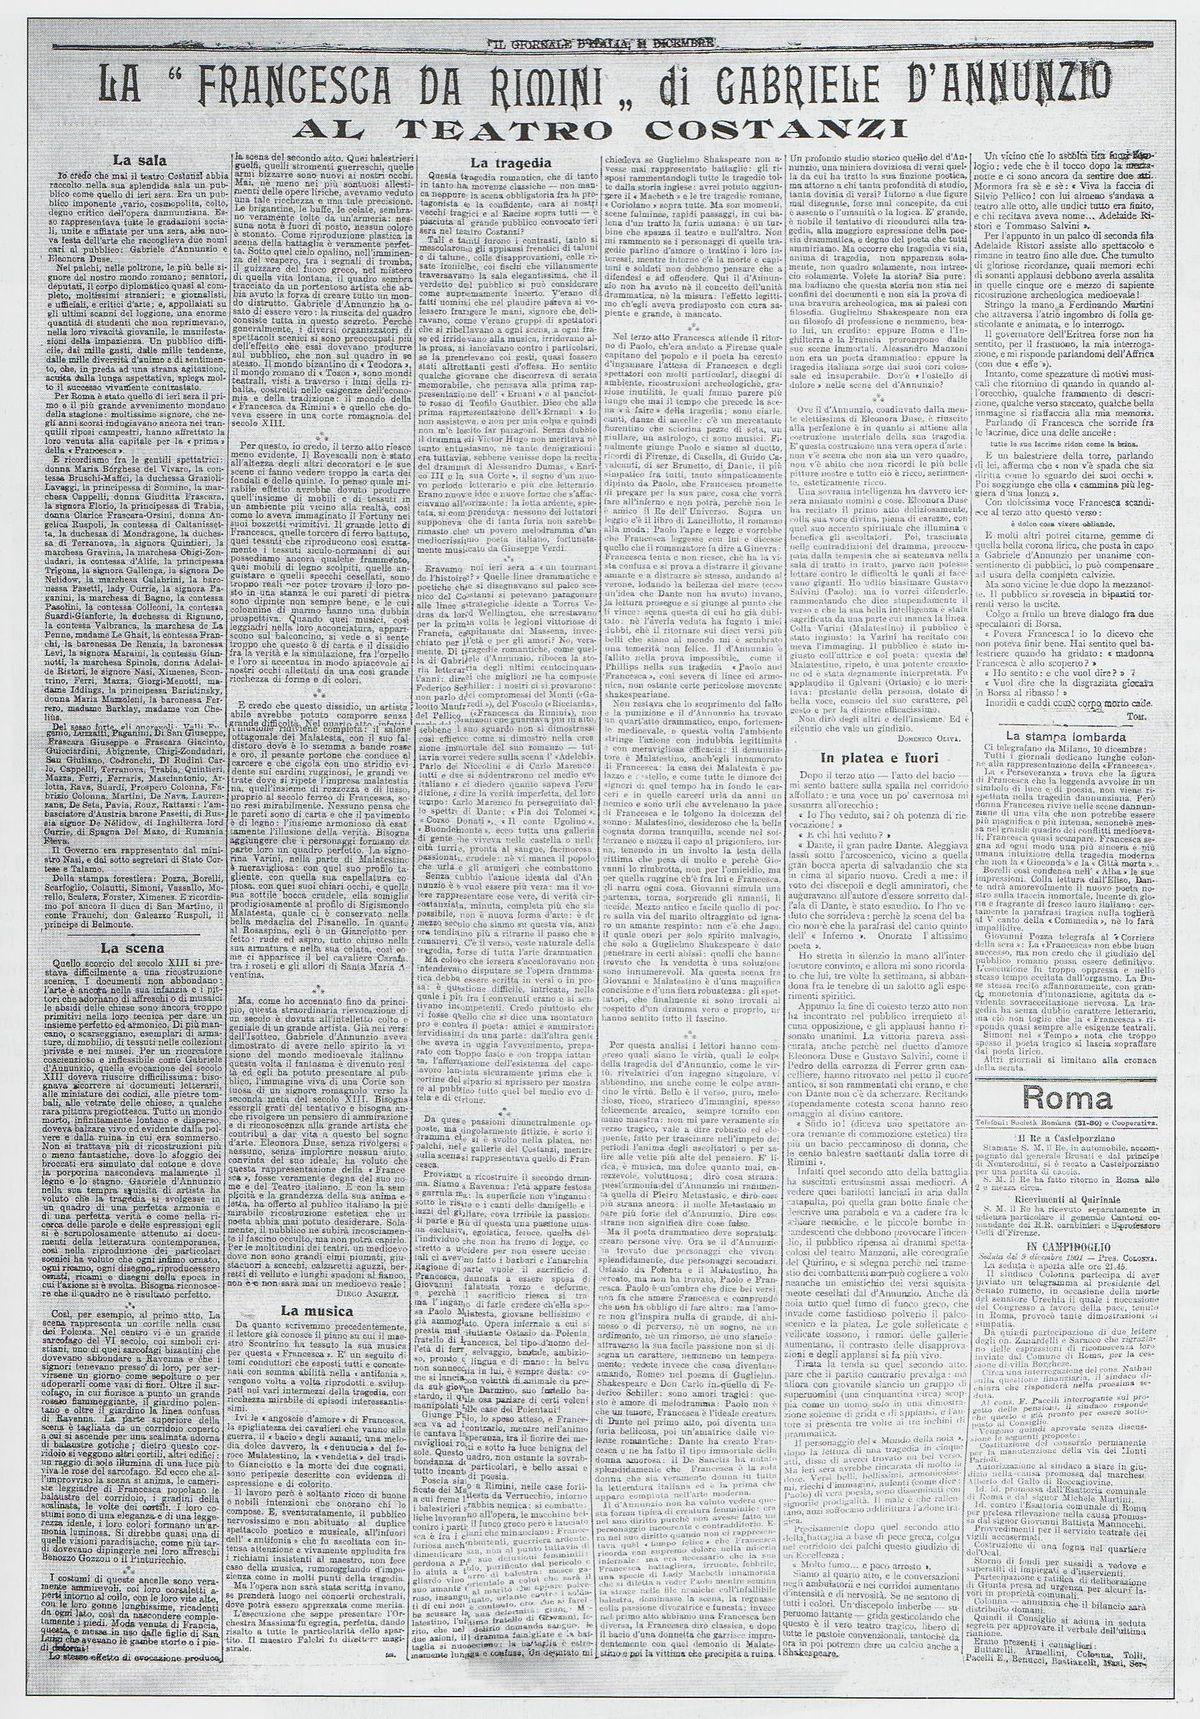 Terza Pagina Wikipedia